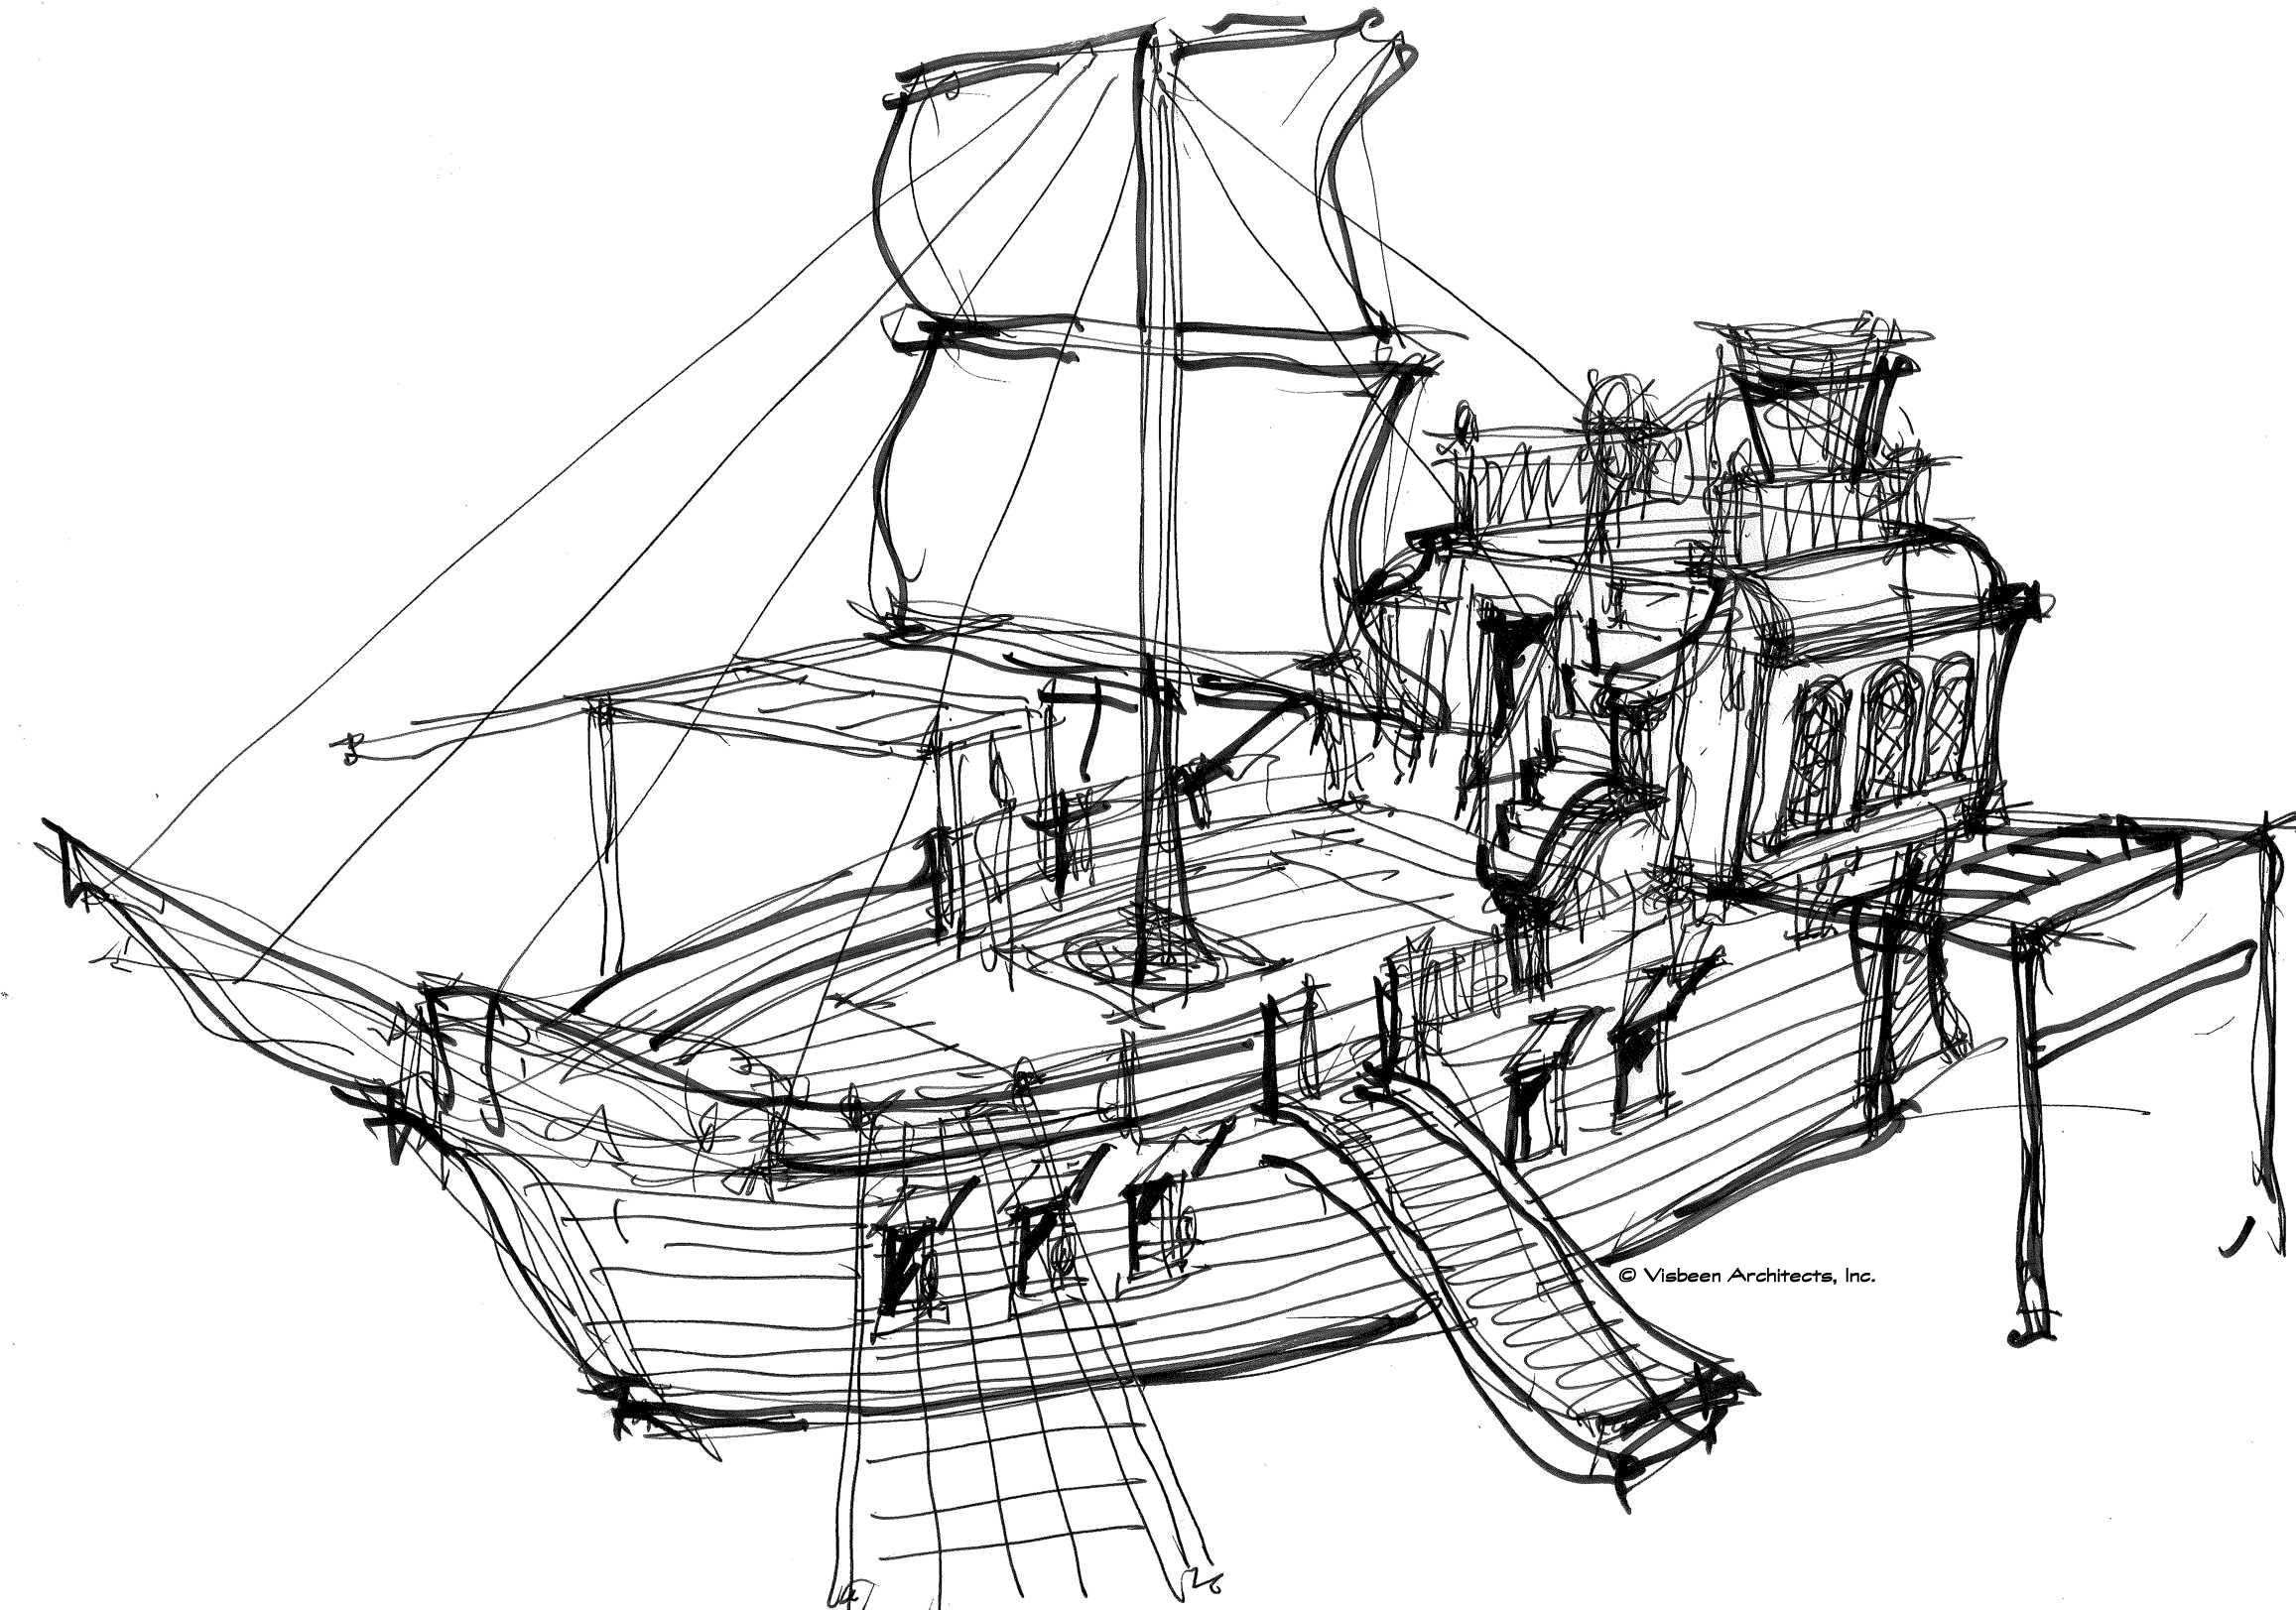 TAI Jolly Roger 2.jpg